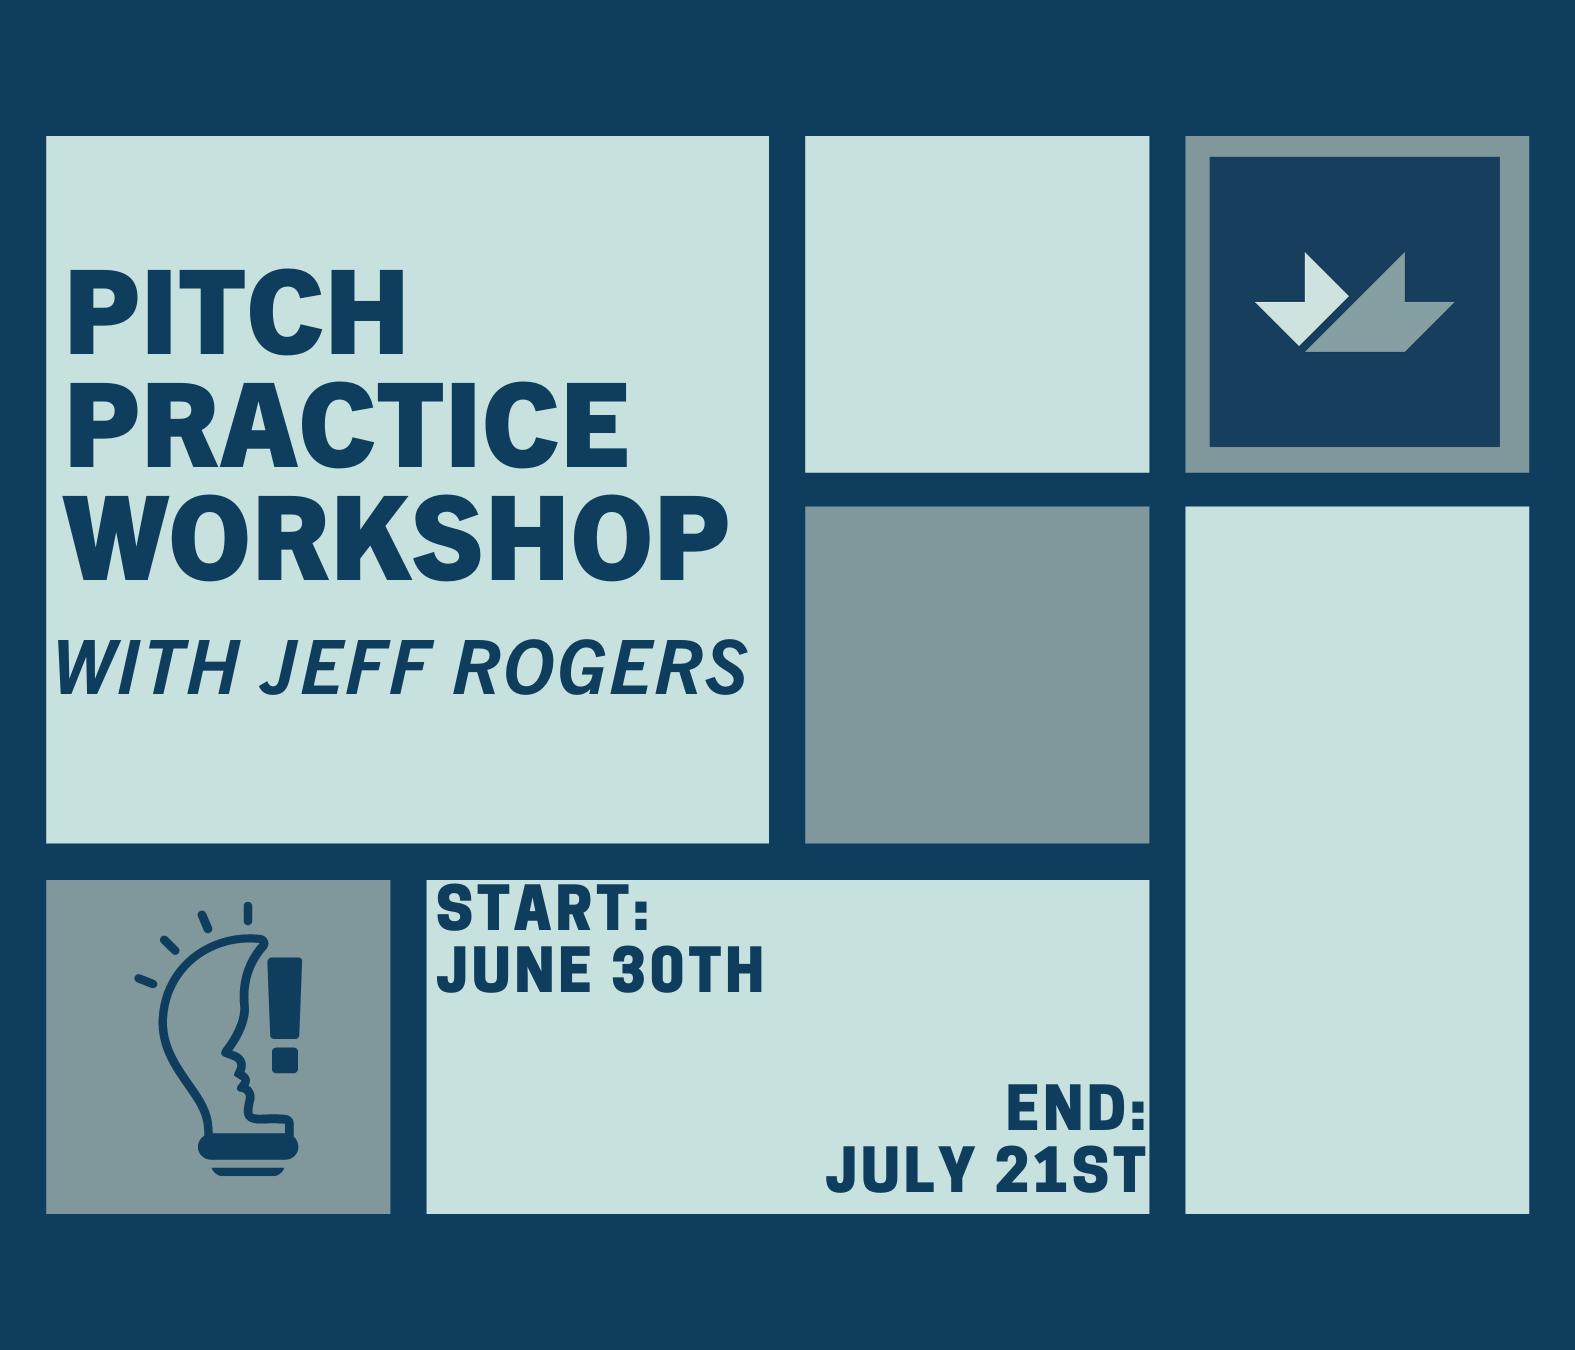 Pitch Practice Workshop